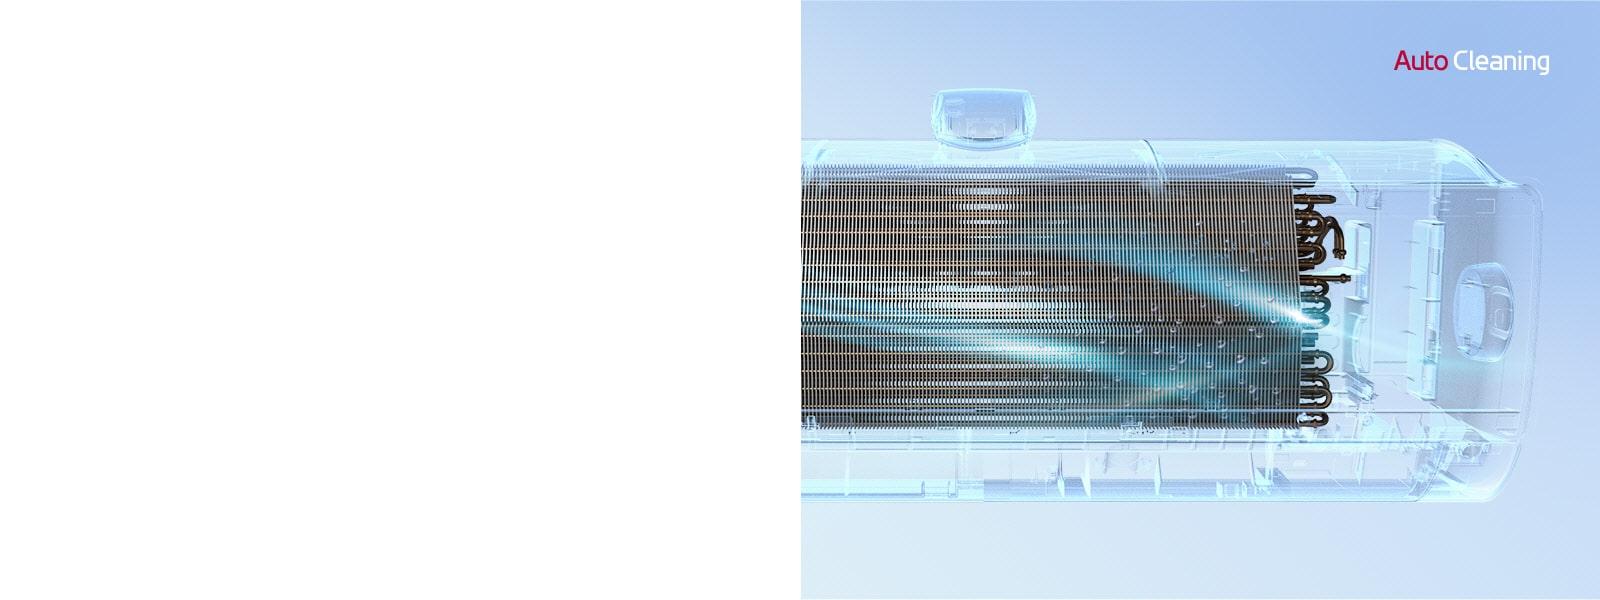 LG 空調的前視圖,其外殼纯透明,讓您可見機器內部工作原理。機器正在運轉,然後自動清潔功能的藍光亮起,並利用藍光清潔整台機器。右下角顯示 AutoCleaning 標誌。